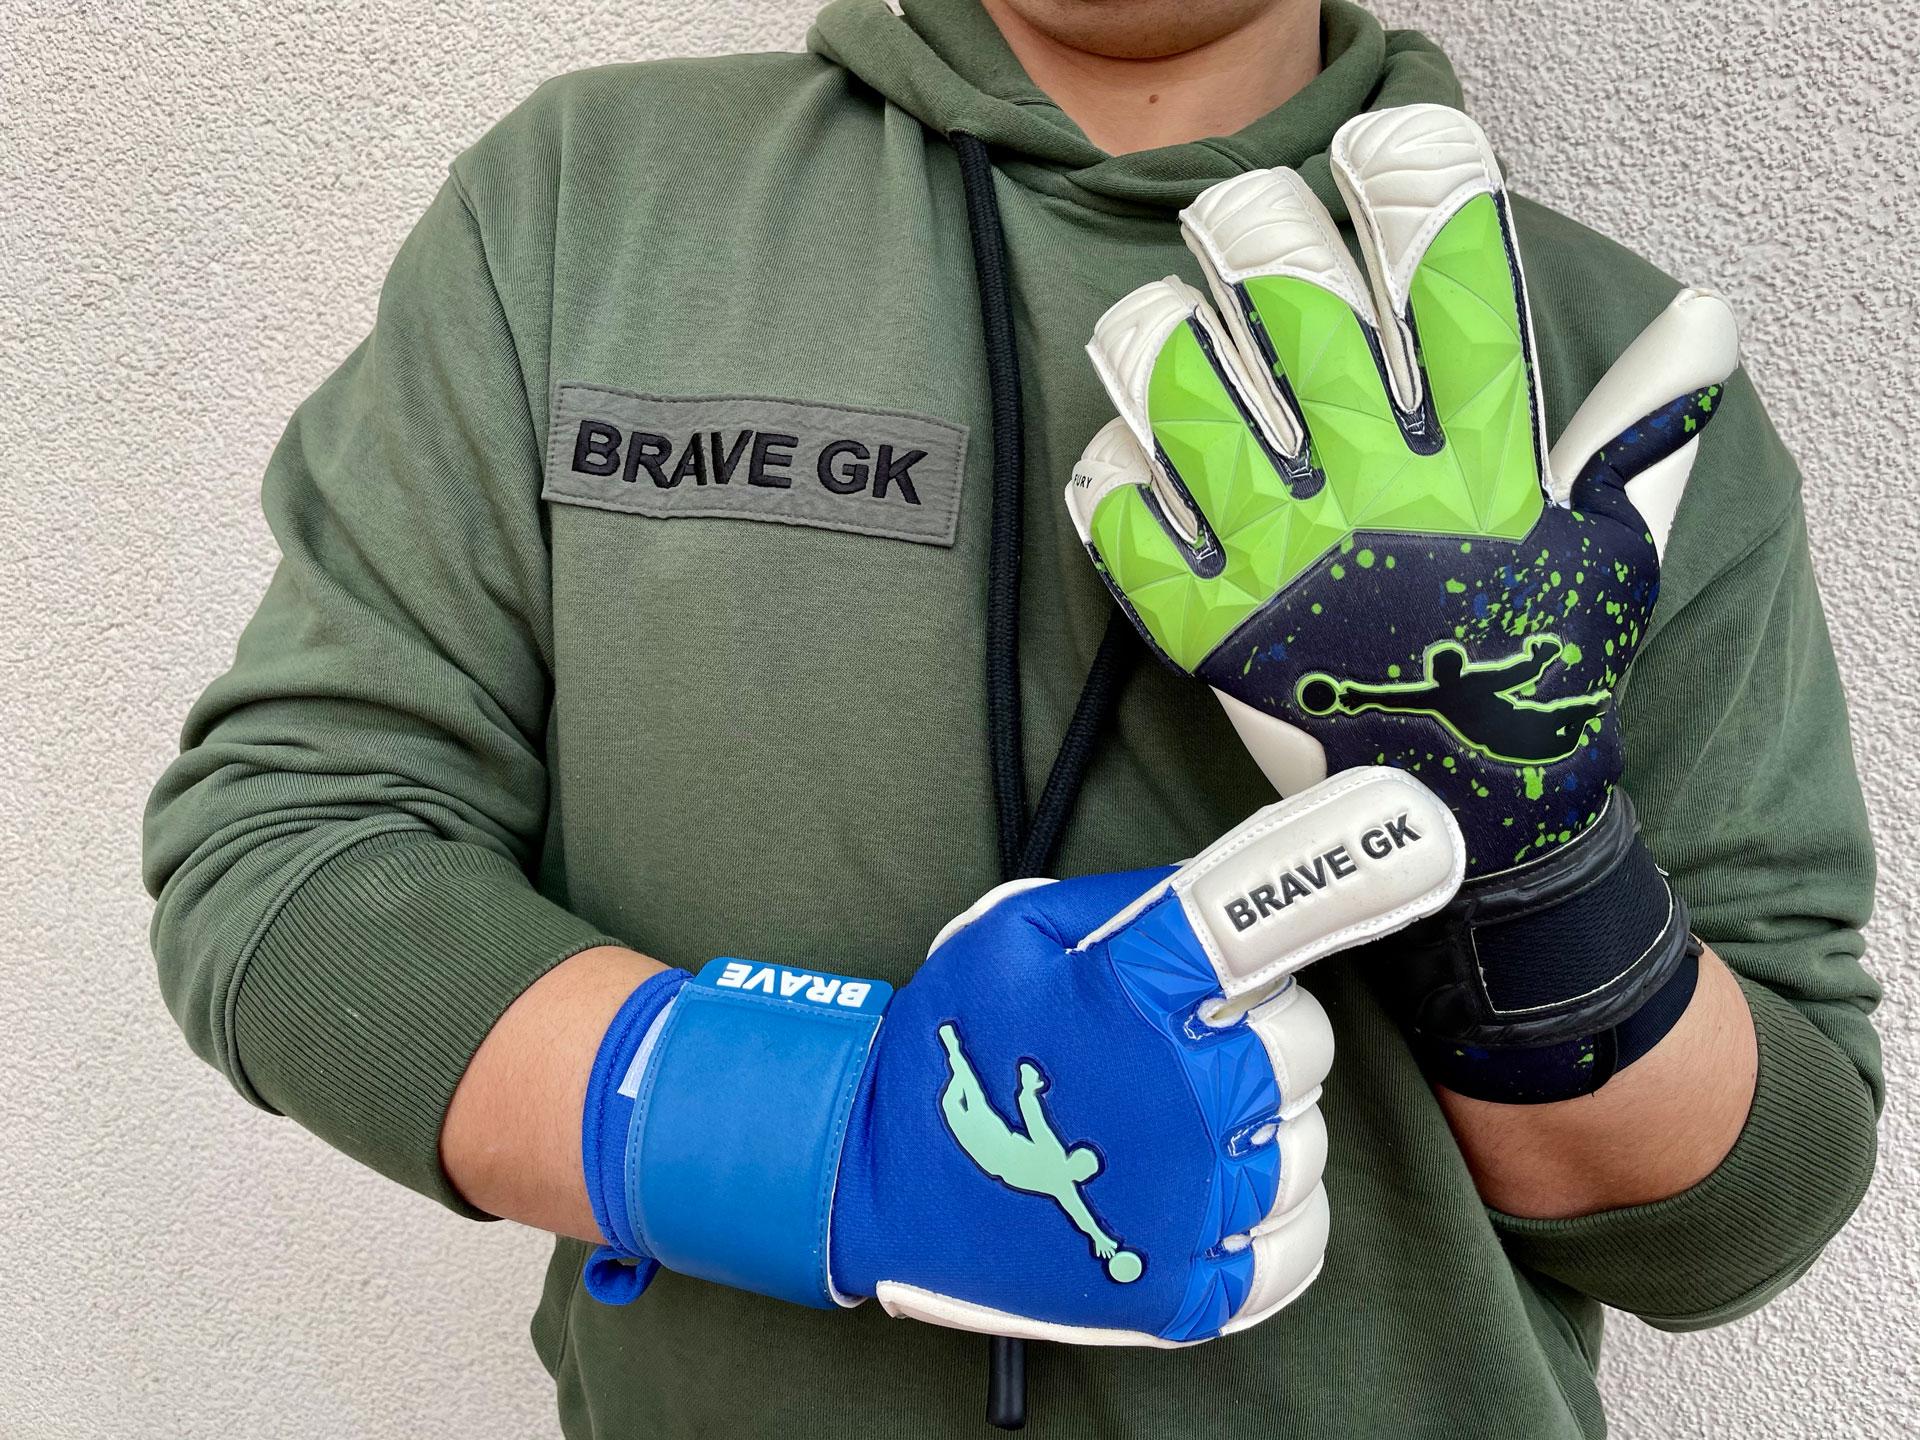 Brave GK Unique Blue і Fury 2.0 Green Paint Drops - официальный интернет-магазин Brave GK